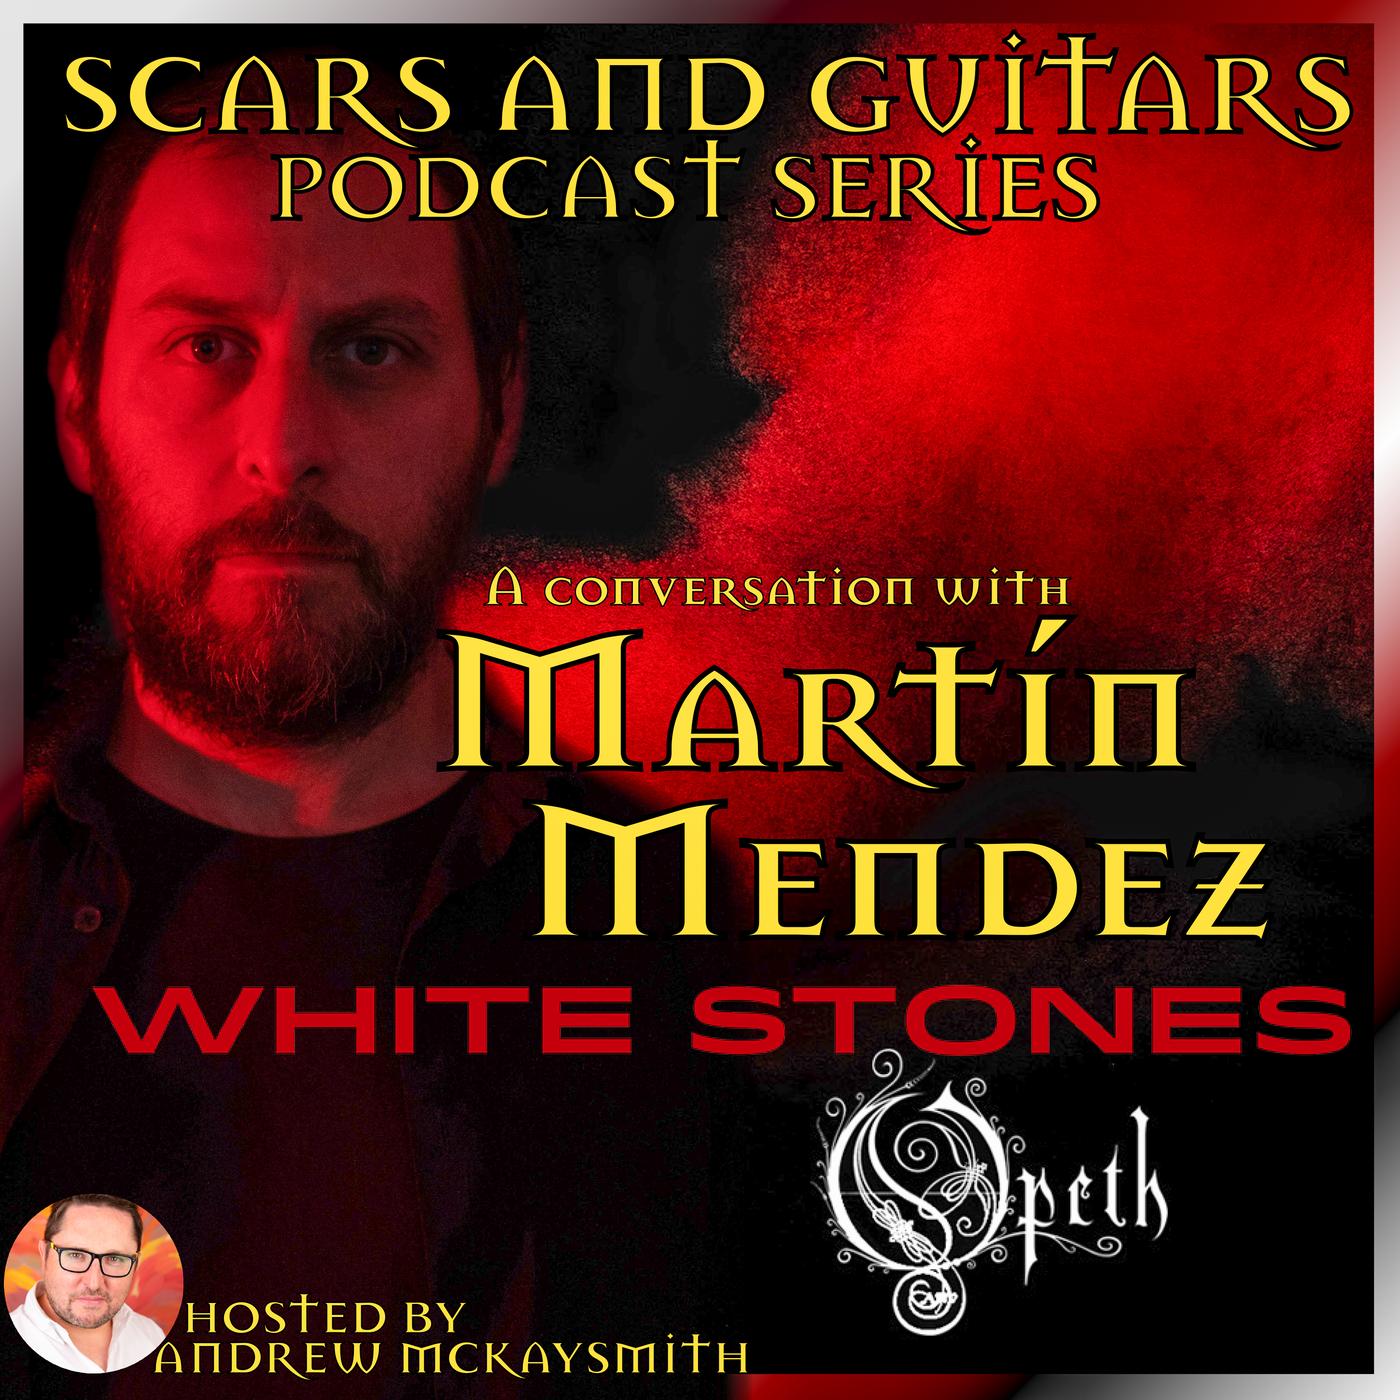 Martin Mendez (Opeth/ White Stones)